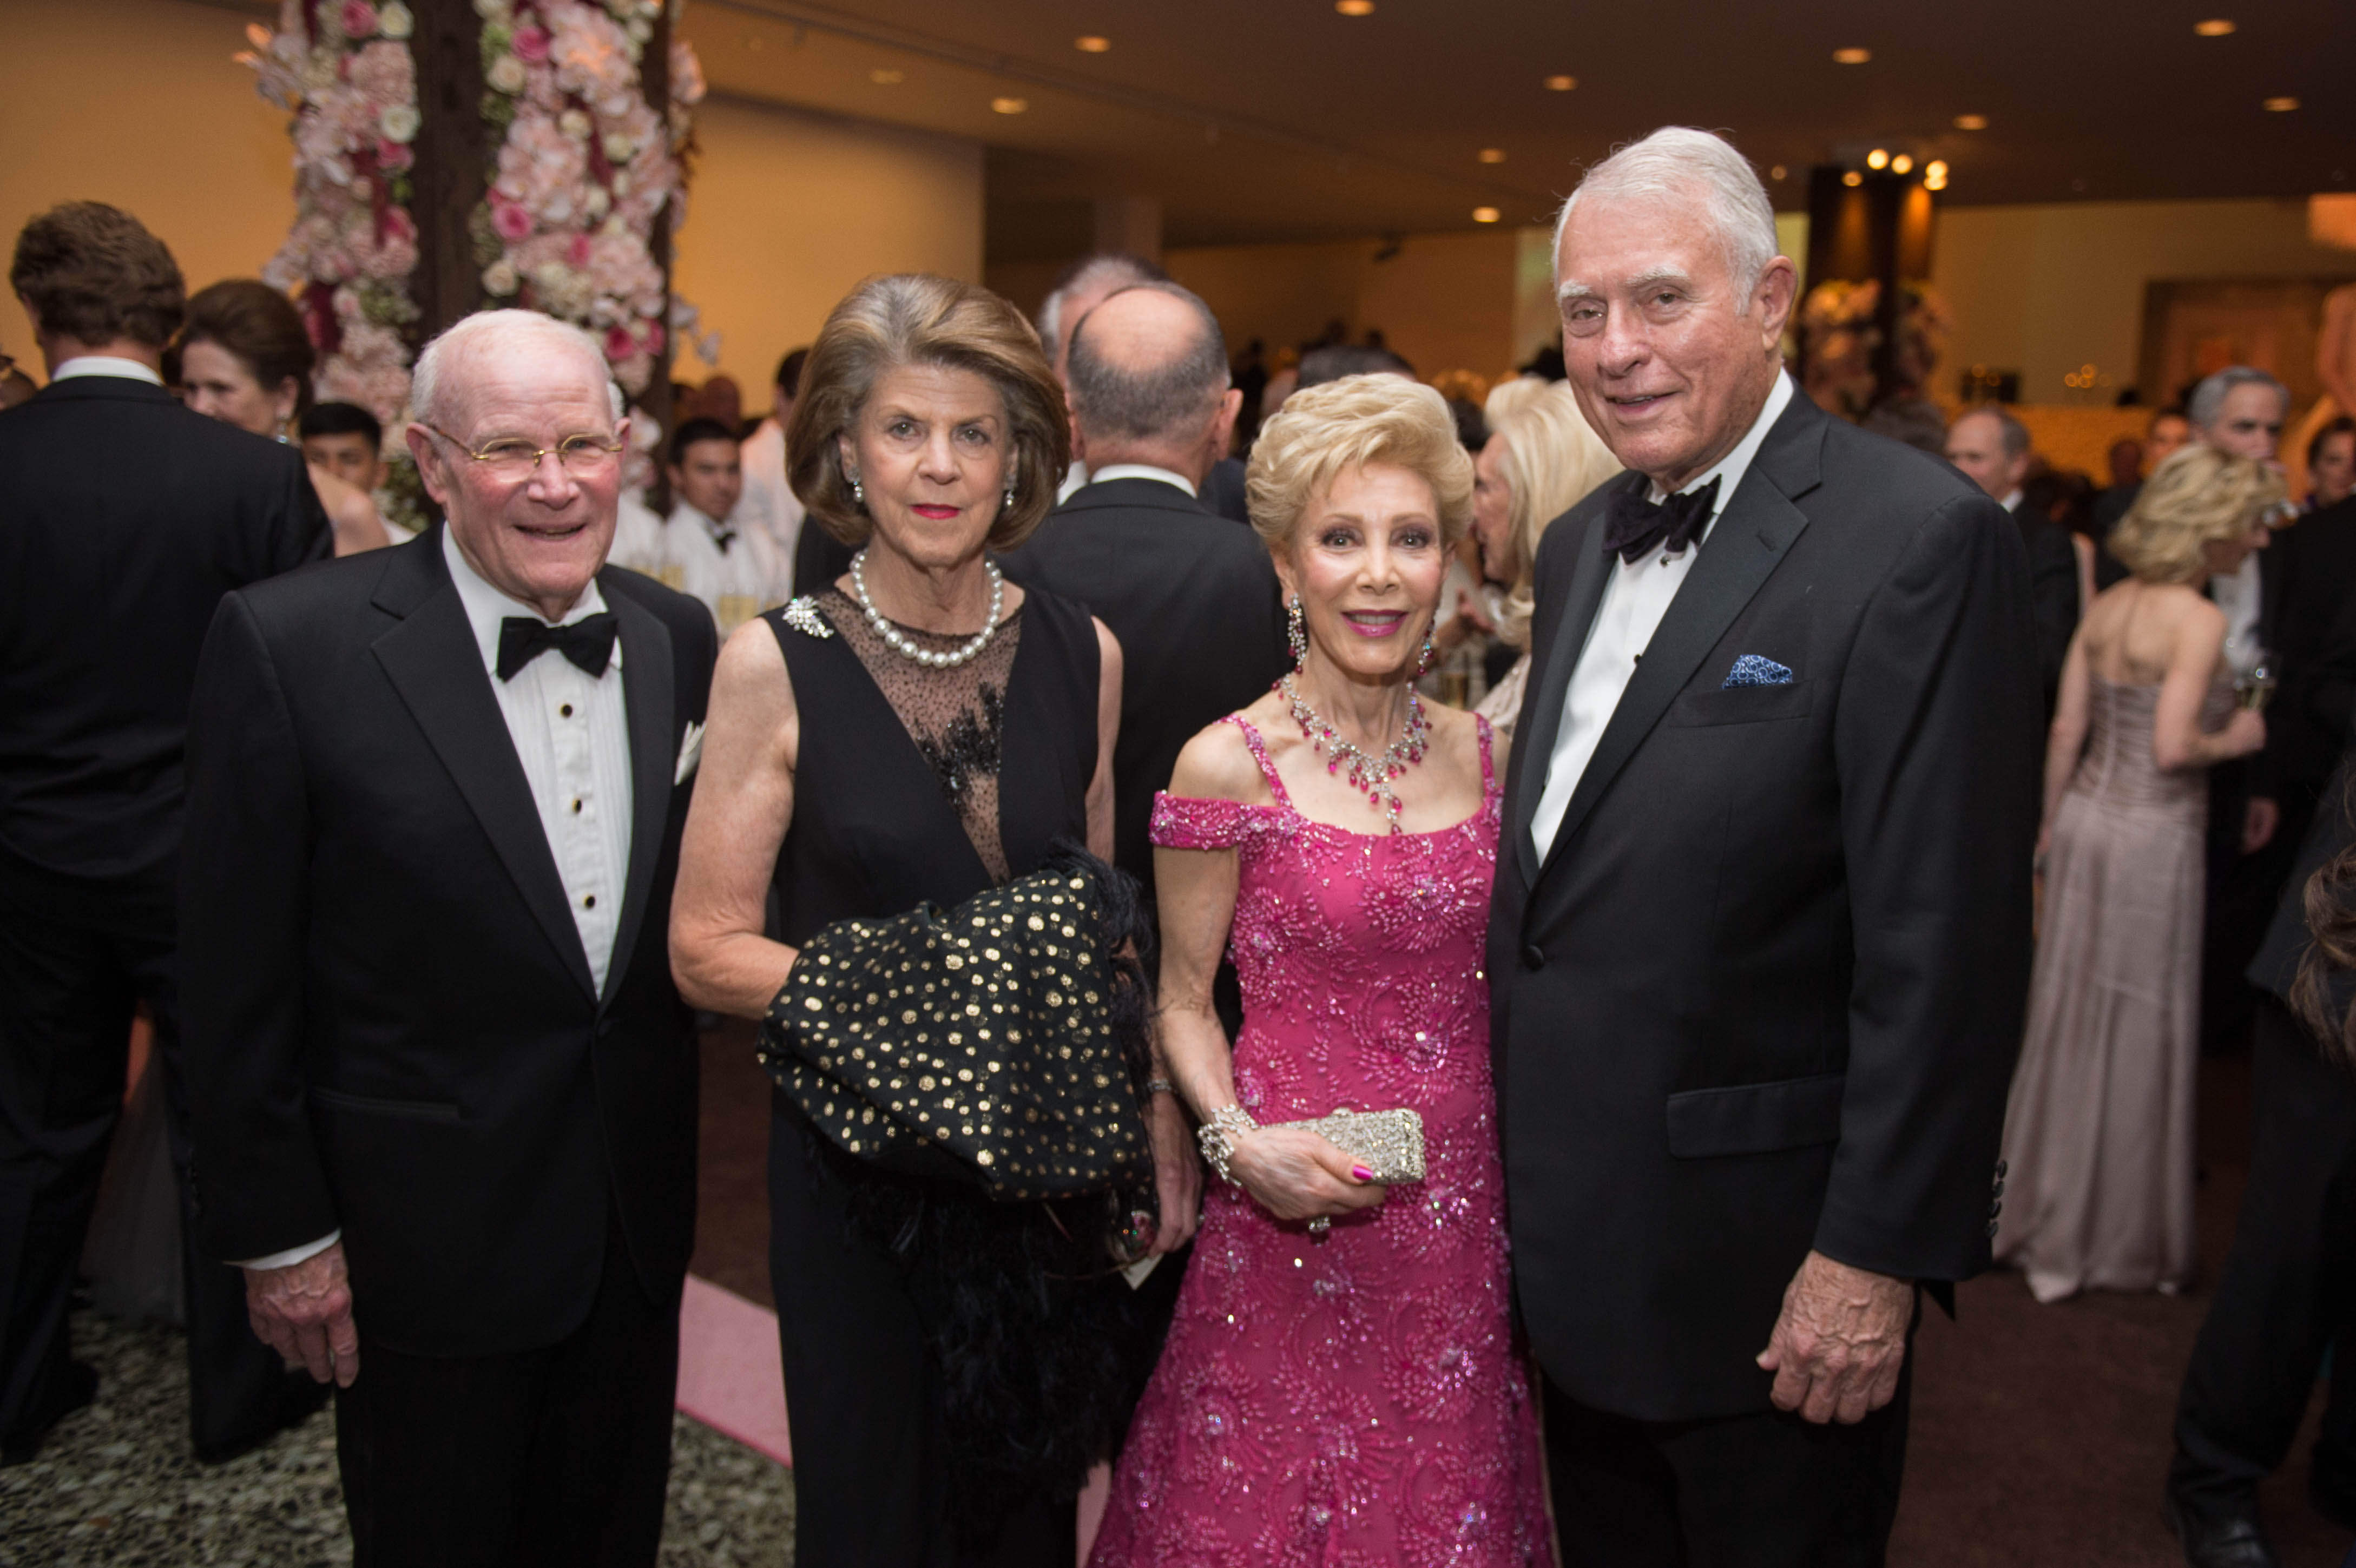 Rodney and Judy Margolis; Margaret Alkek Williams and Jim Daniel; Photo by Wilson Parish